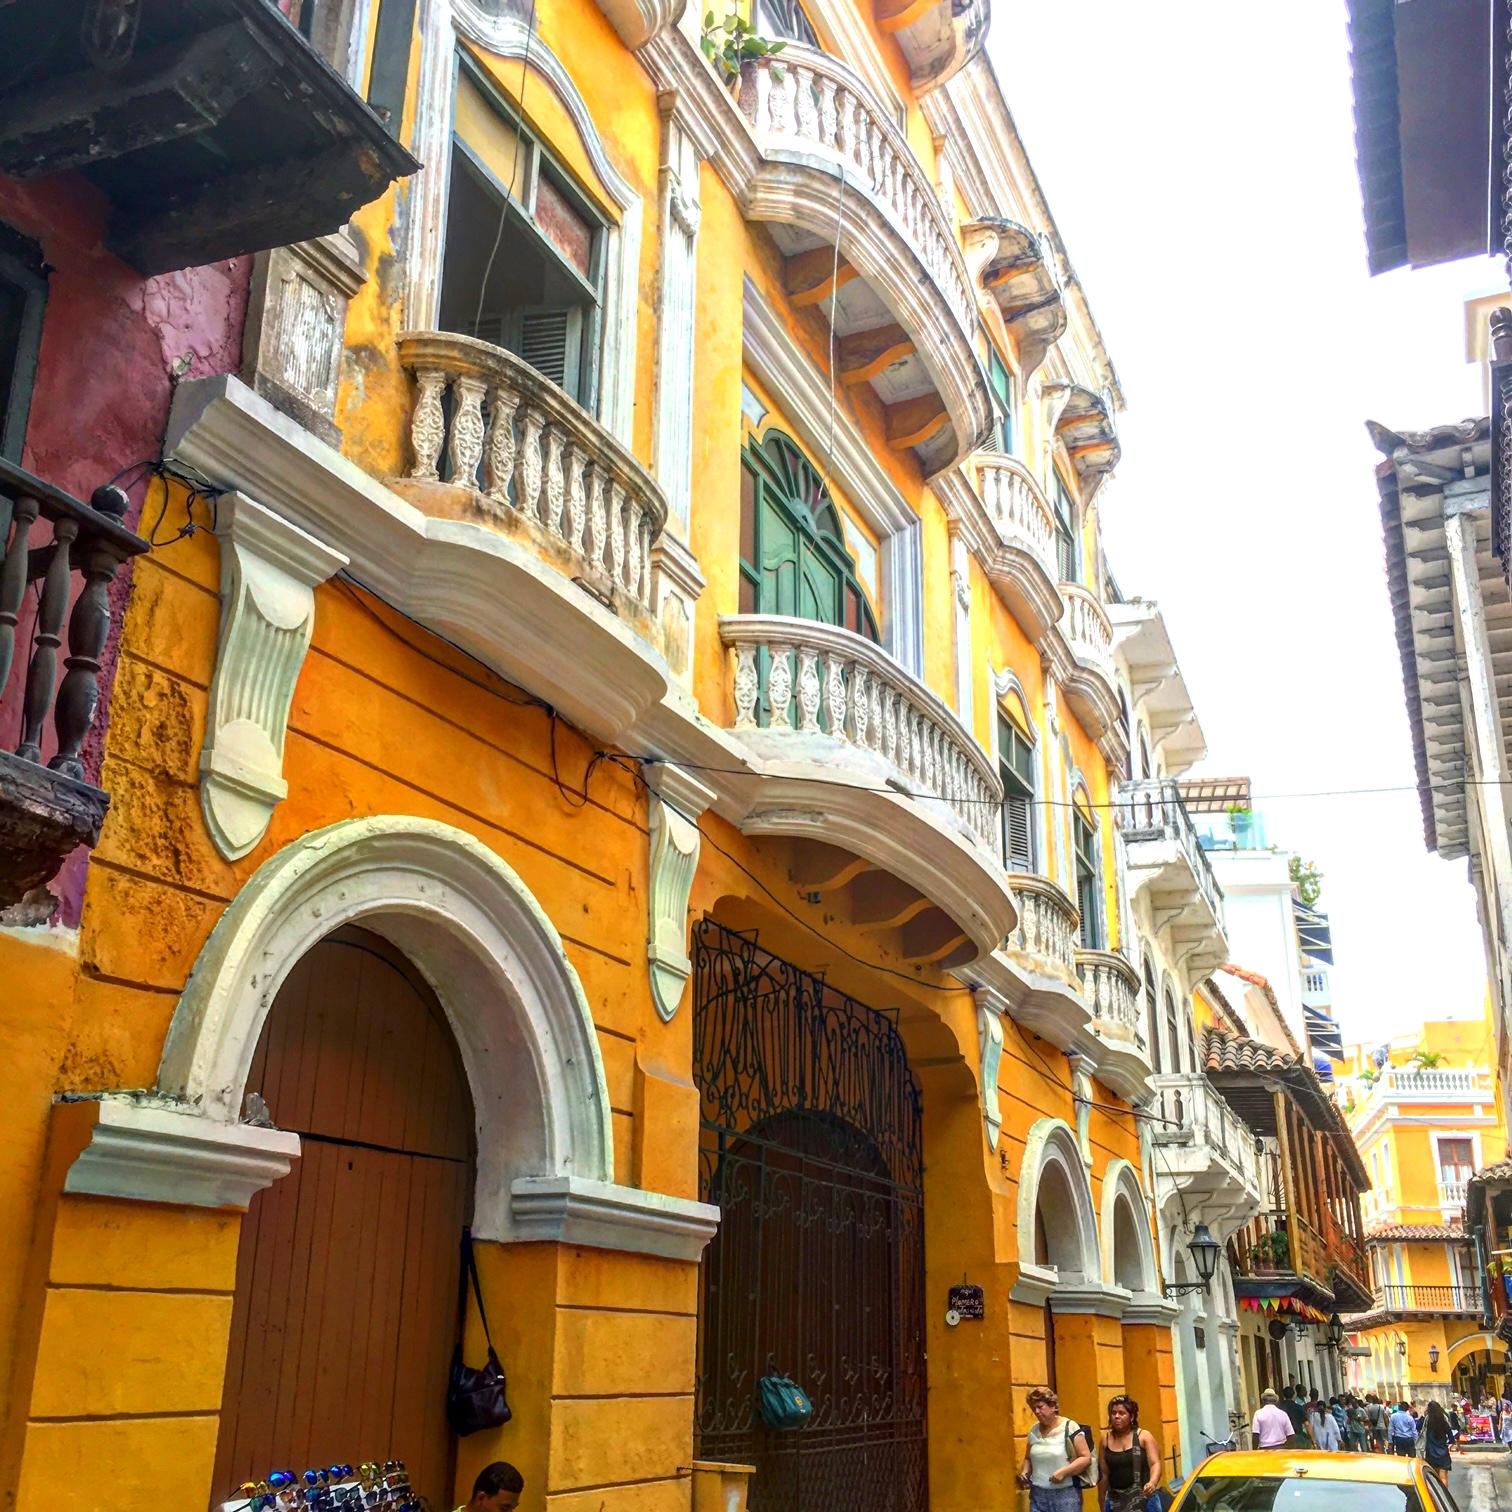 Streets of Cartagena